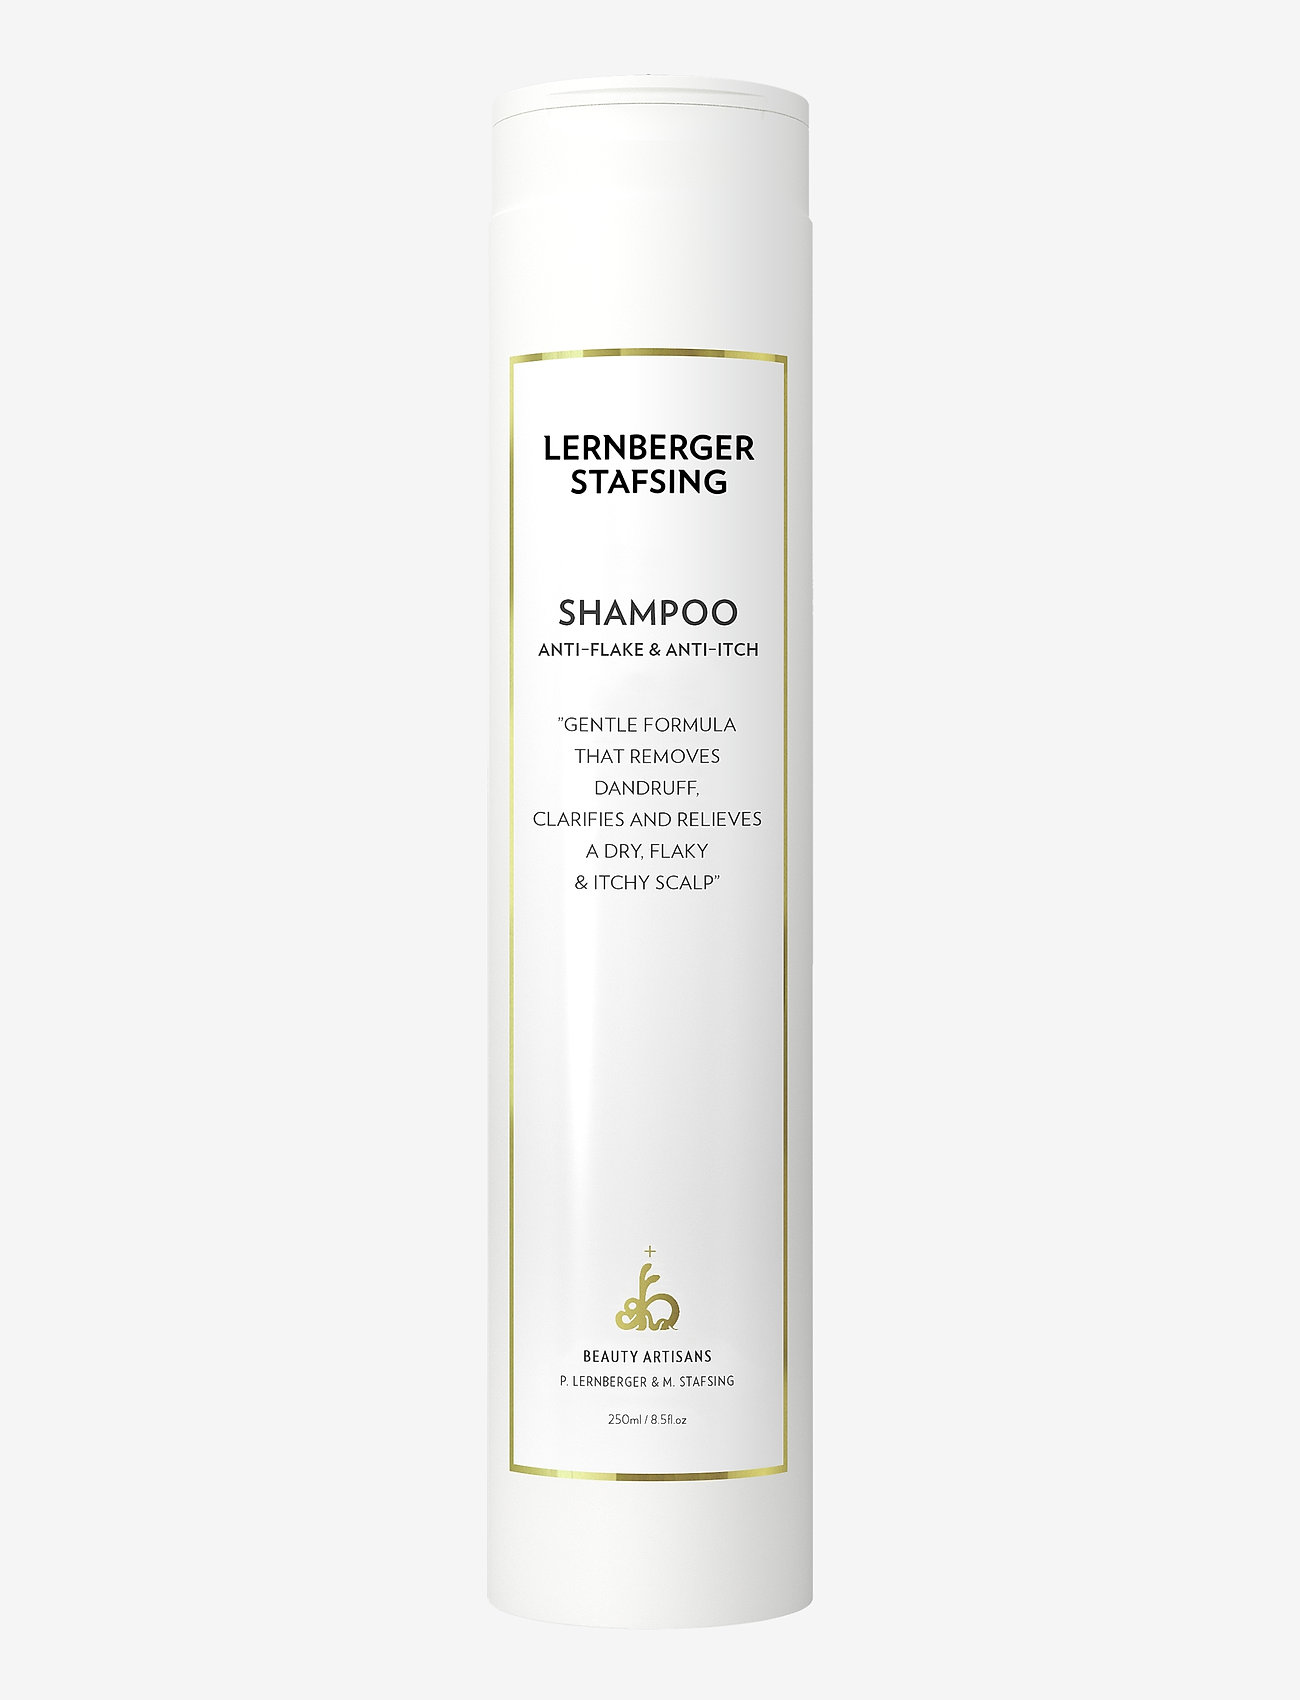 Lernberger Stafsing - Shampoo Anti-dandruff - no colour - 0